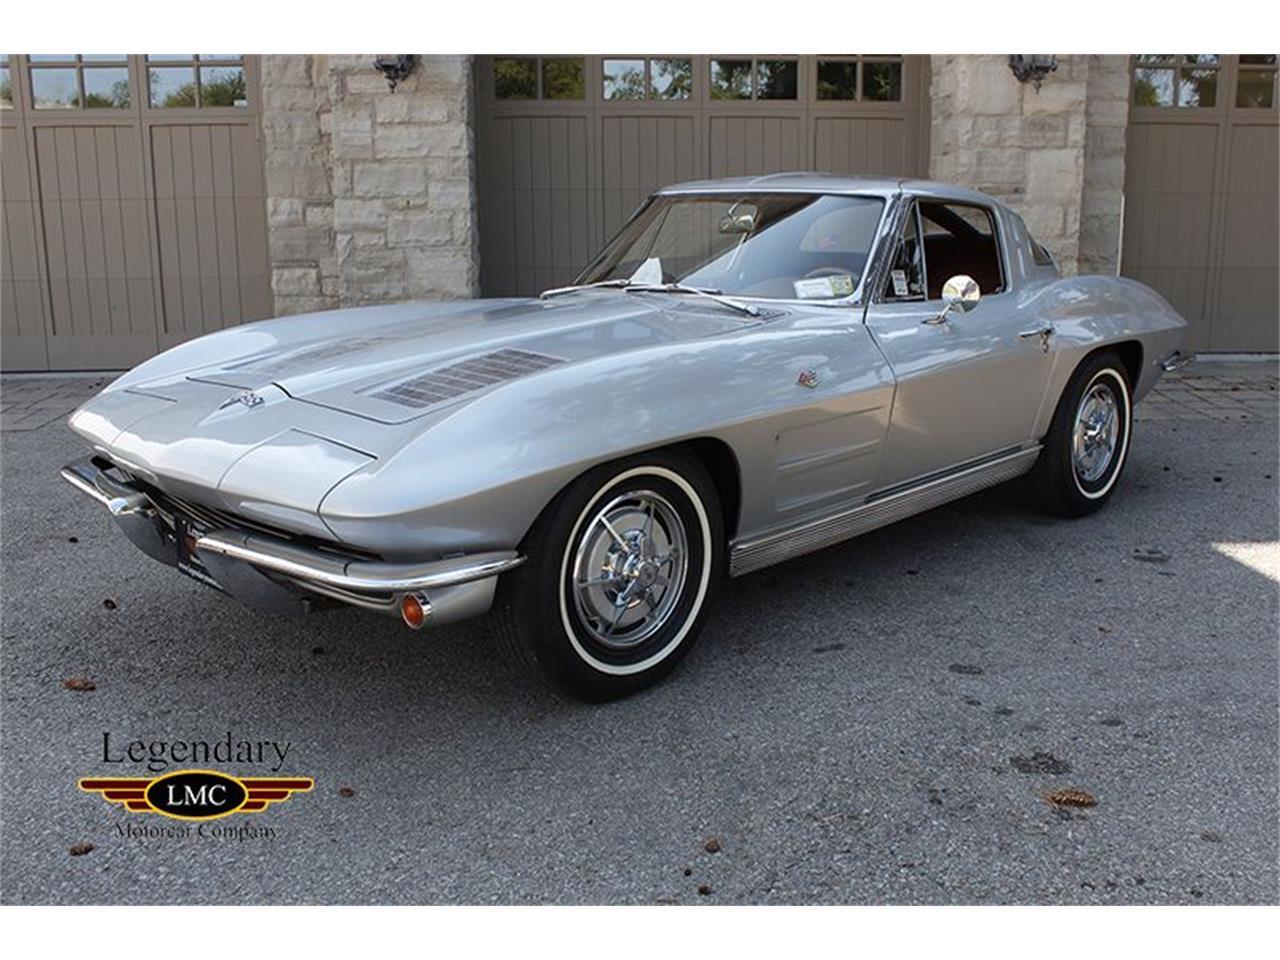 63 Split Window Corvette >> 1963 Chevrolet Corvette Coupe Split Window For Sale Classiccars